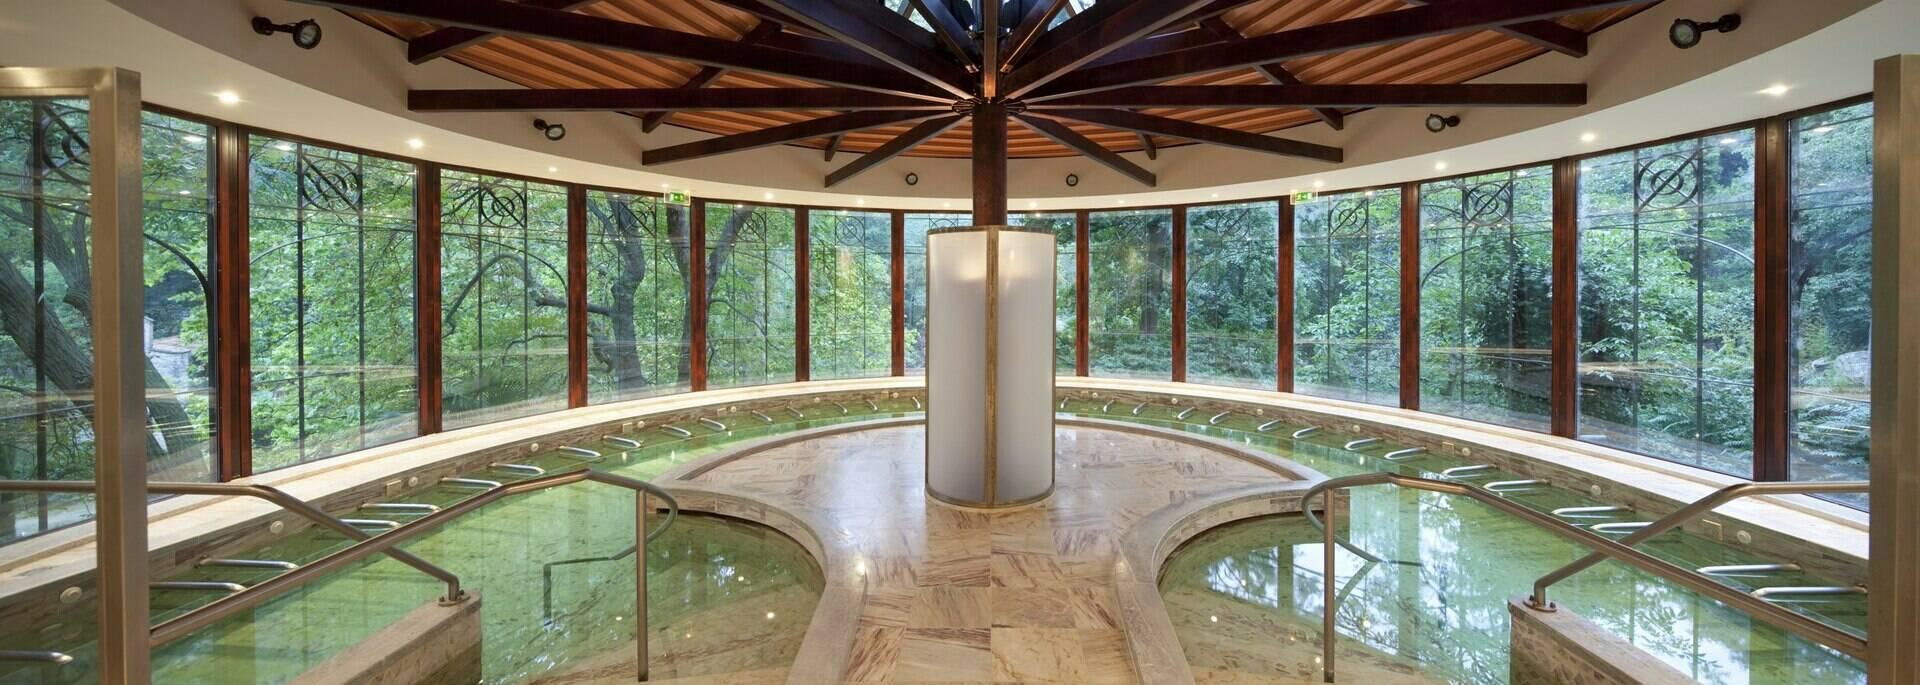 piscine thermale molitg-les-bains